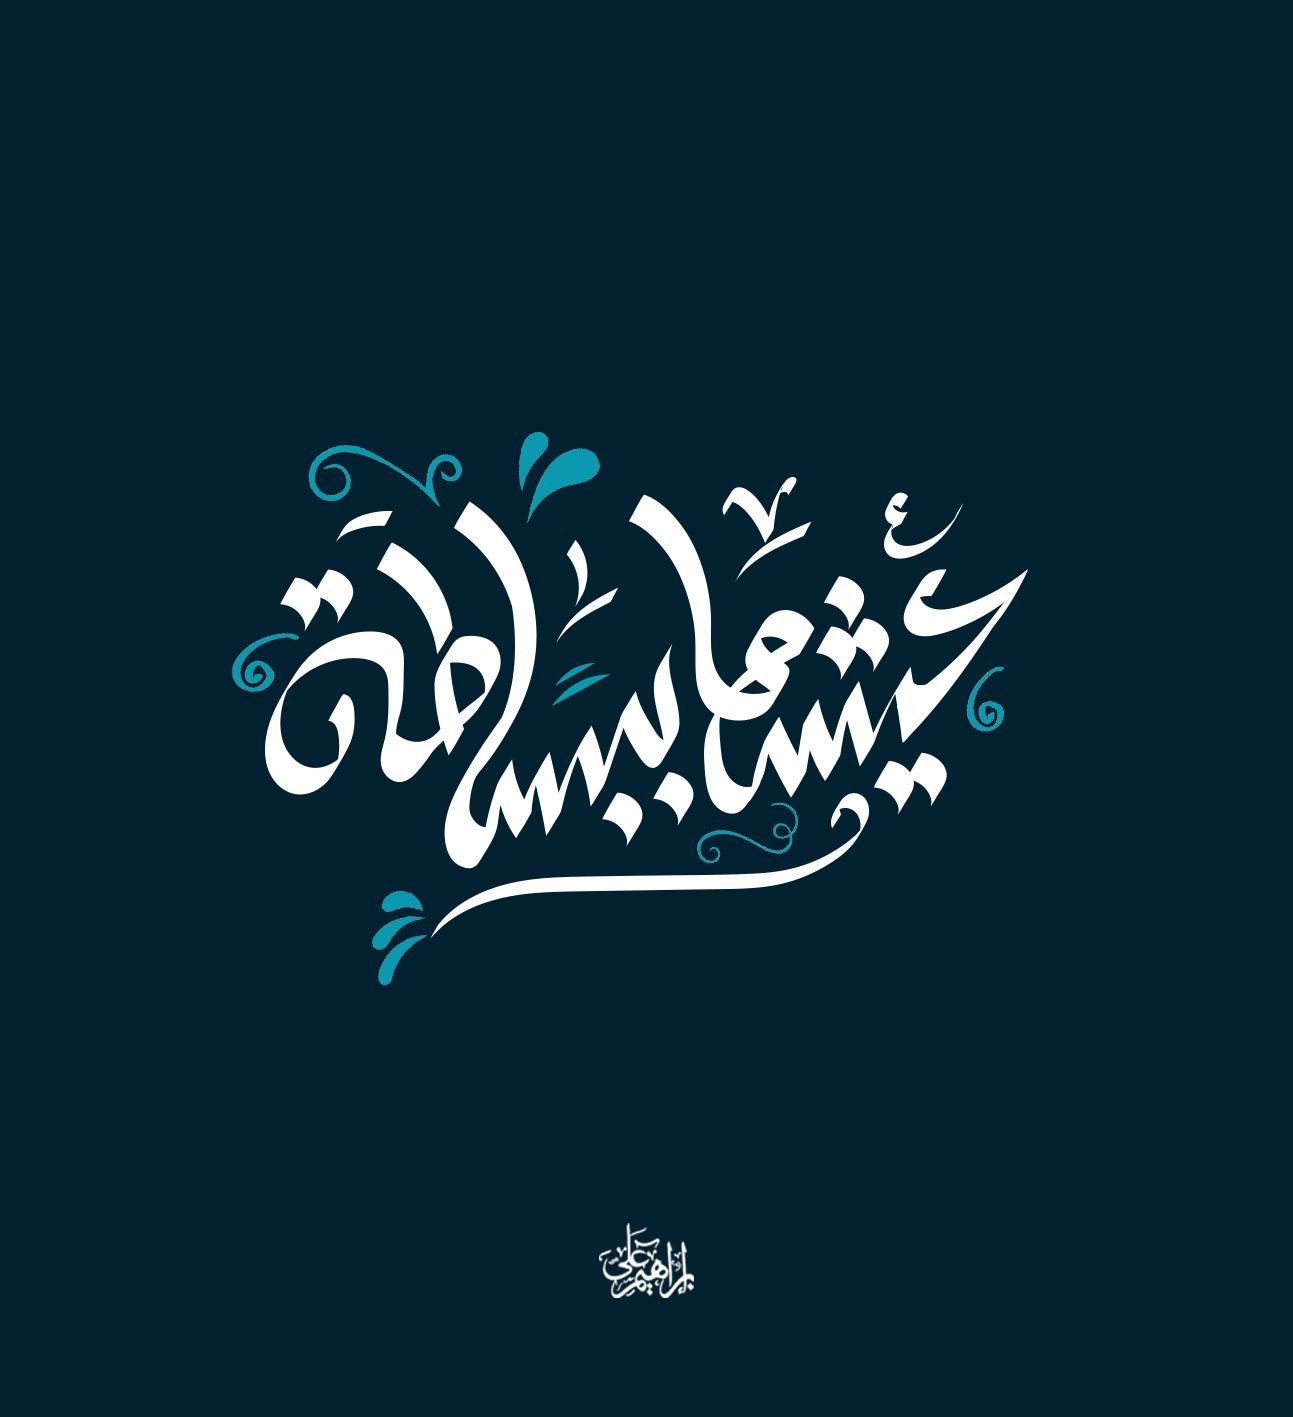 عيشها ببساطة Arabic Typography Typo Calligraphy Art Lettering Typeface تايبوجرافي تايبوغرافي خط Typography Design Quotes Arabic Words Arabic Quotes